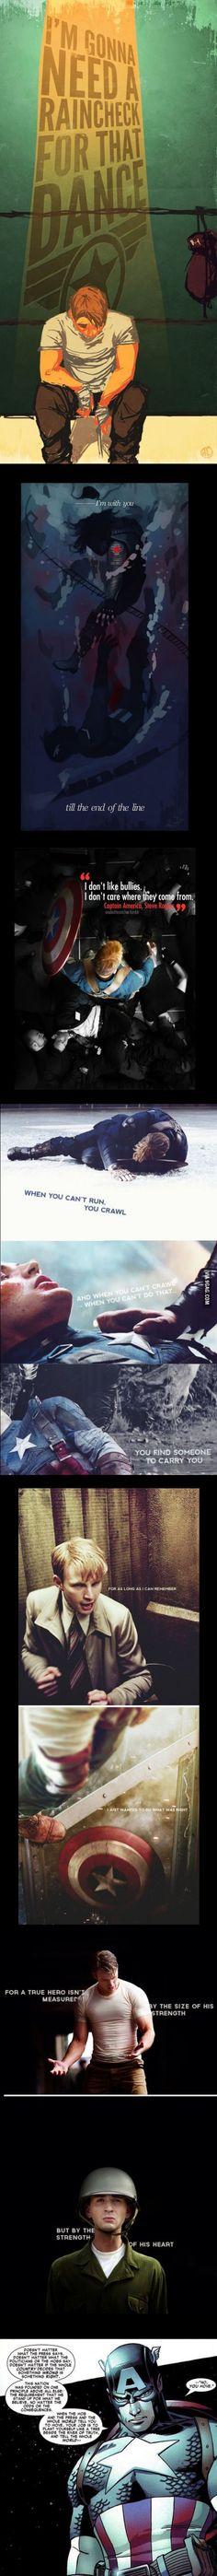 Captain America, Steve Rogers, comics, comic books, comic book movies, marvel comics, film, 2010s